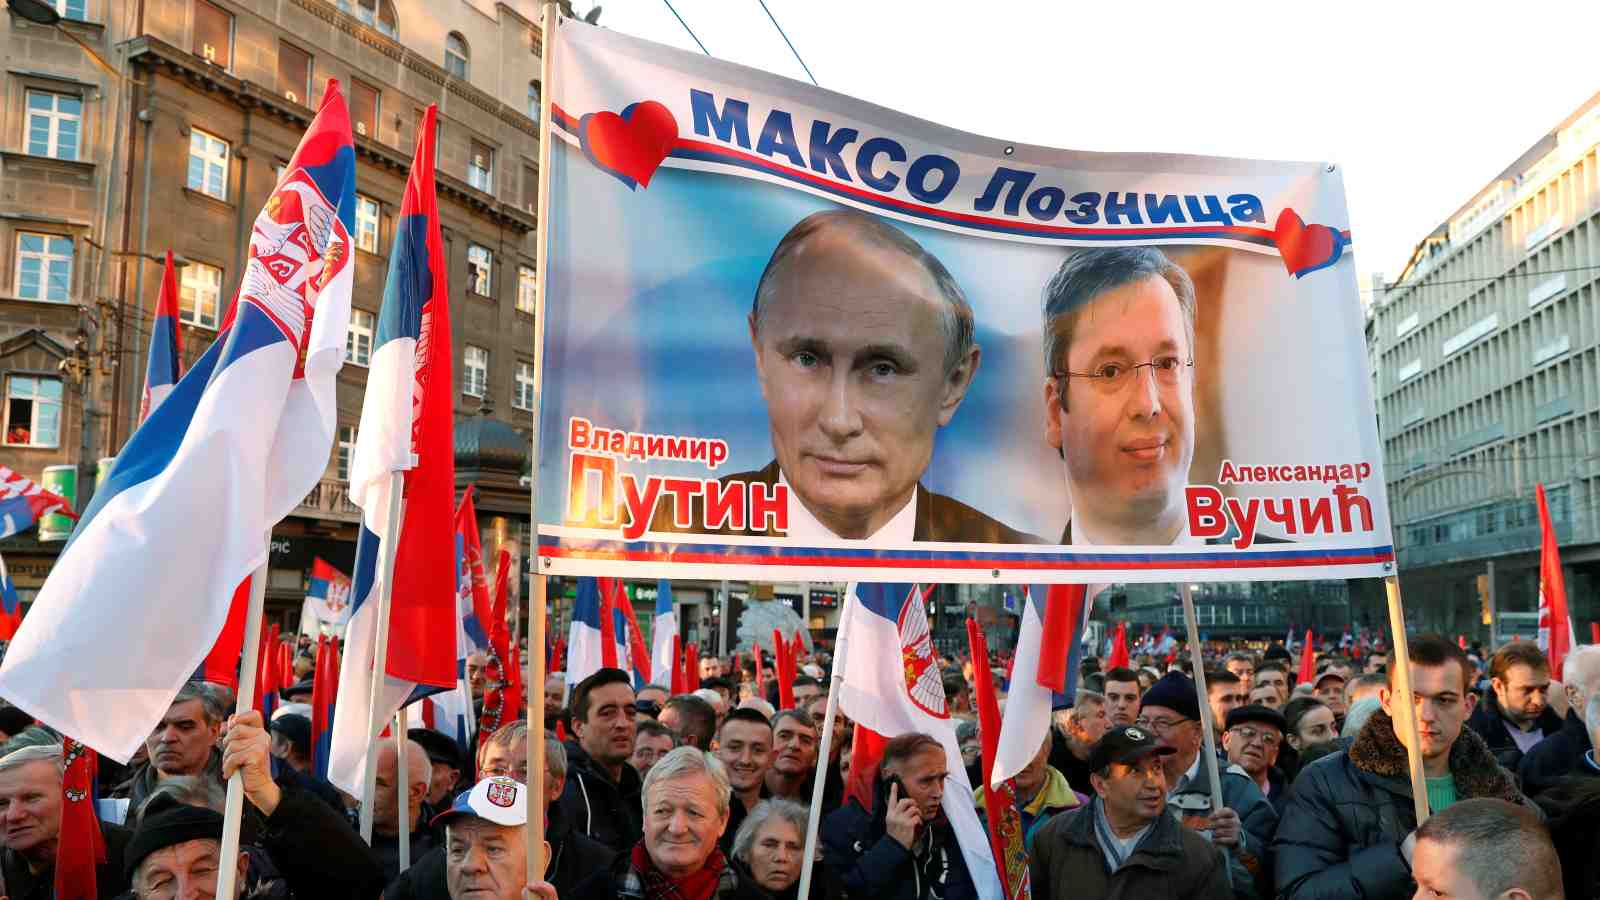 Photo: Supporters of Serbian President Aleksandar Vucic and Russian President Vladimir Putin walk towards St Sava temple in Belgrade, Serbia, January 17, 2019. Credit: REUTERS/Bernadett Szabo.